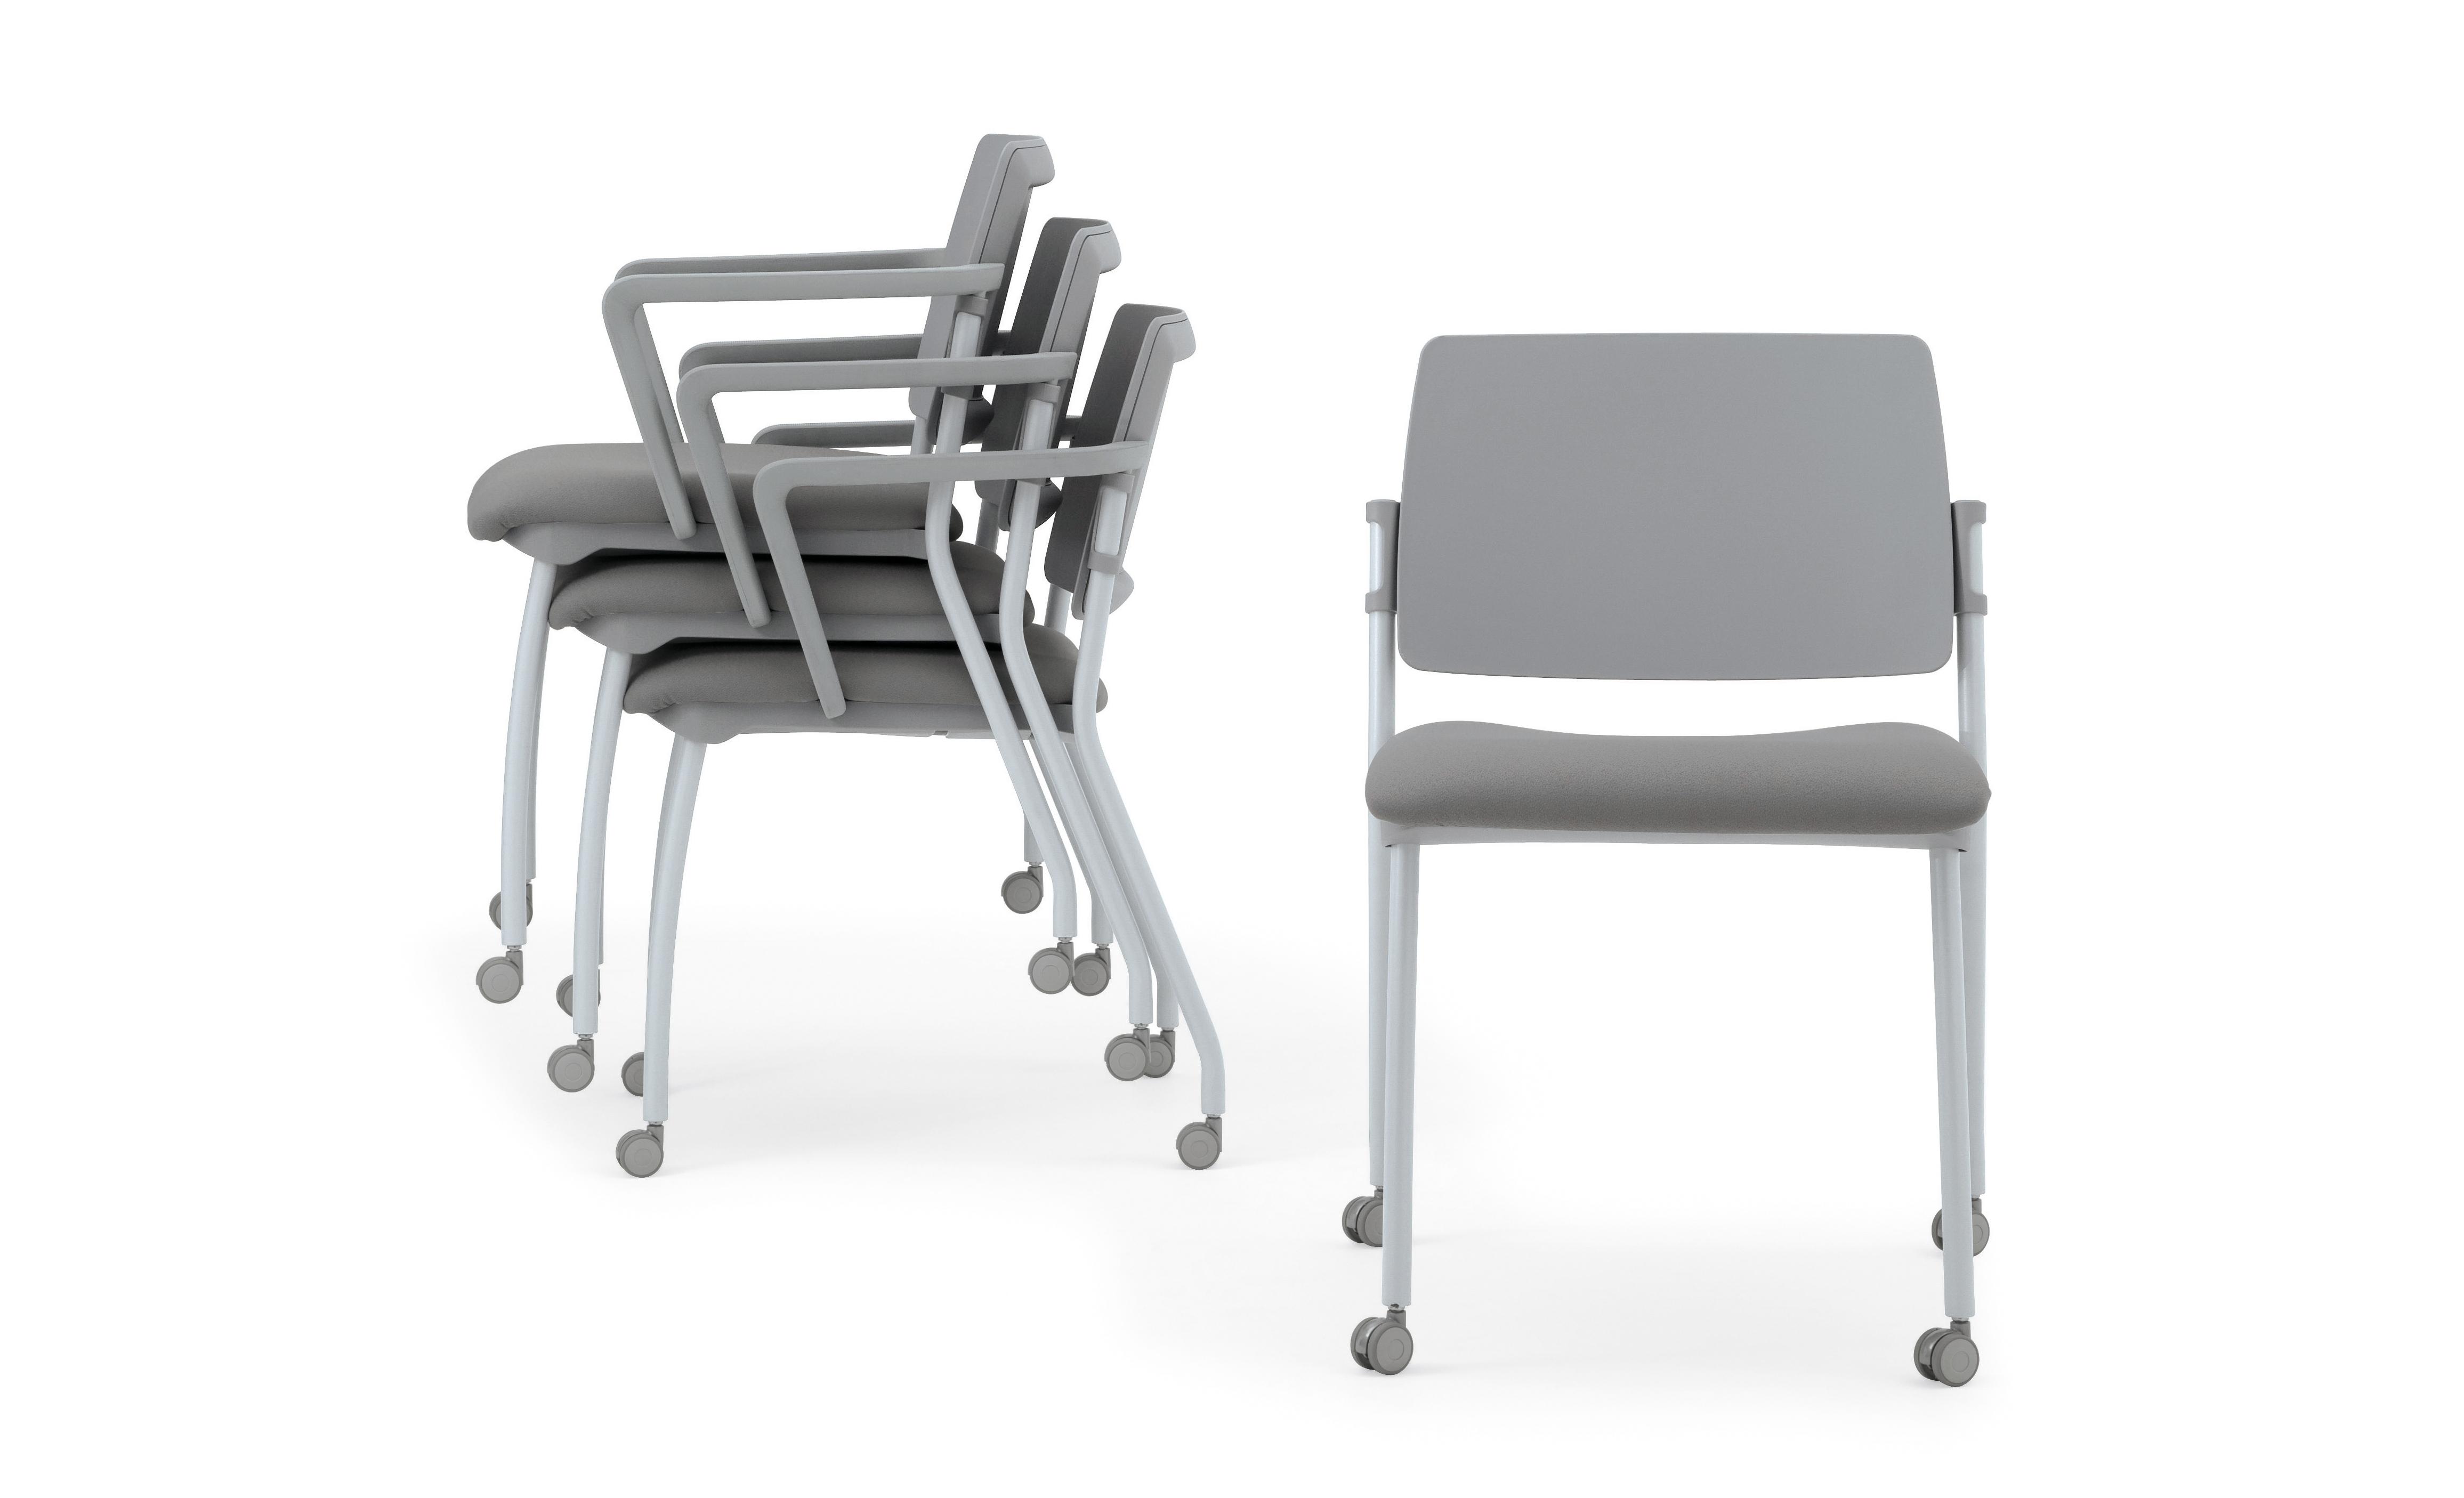 Diemmebi - Tappezzare una sedia ...